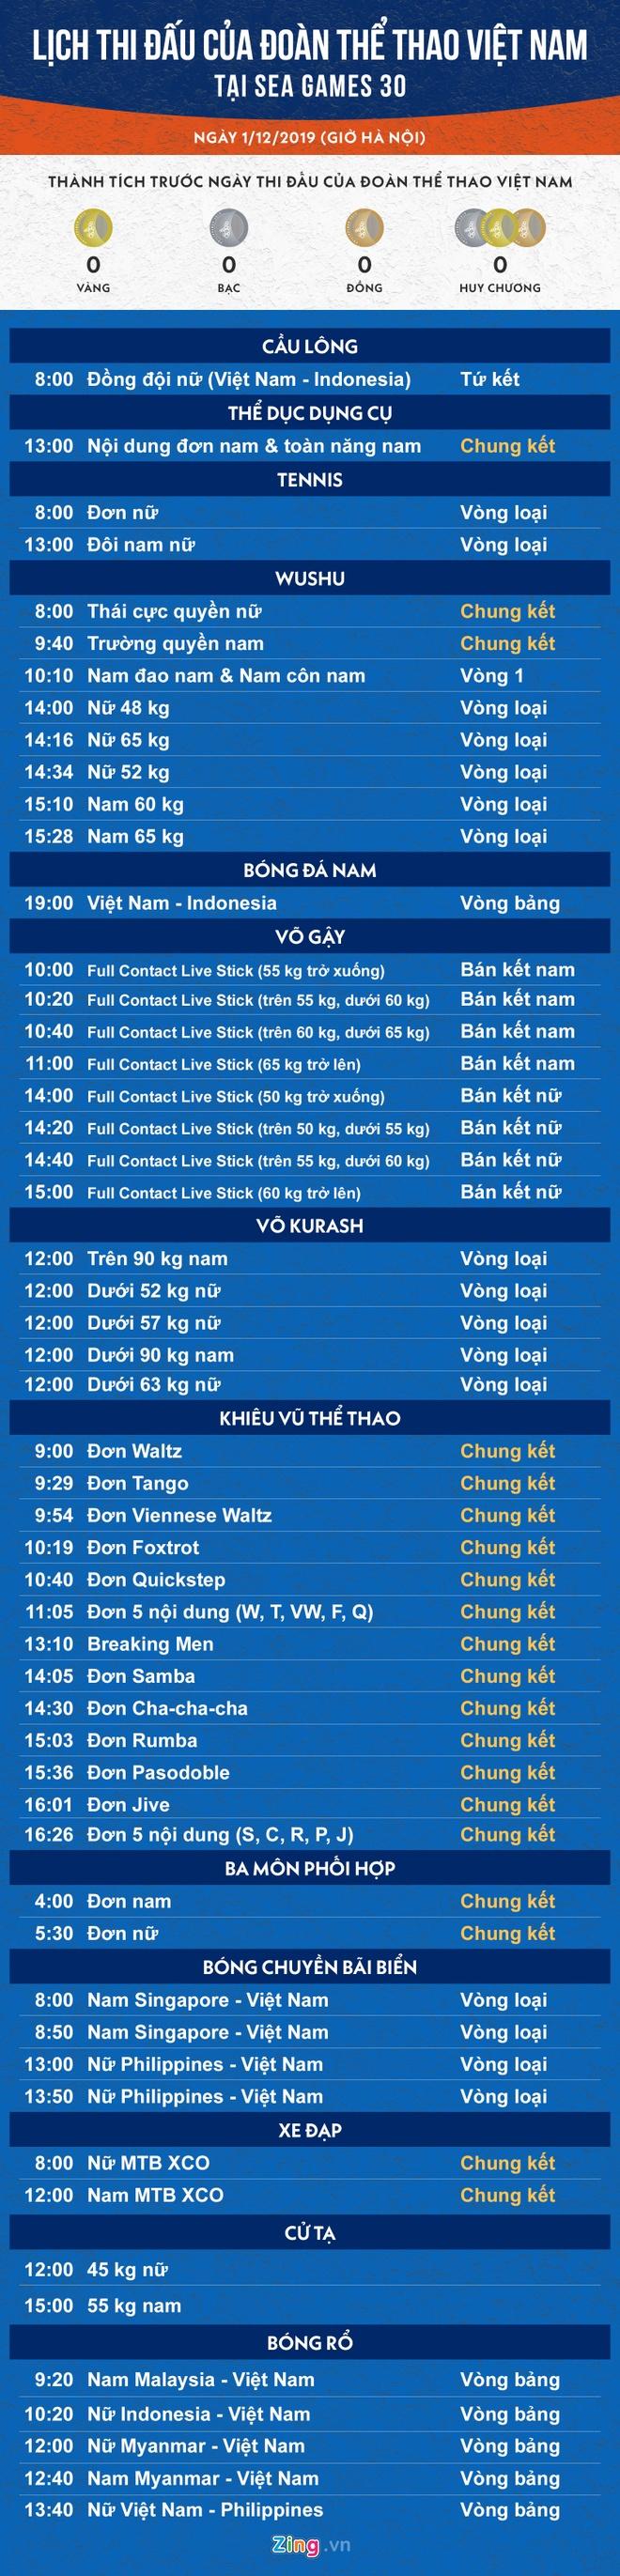 Doan Viet Nam dung thu 2 BXH voi 10 HCV sau ngay thi dau tien hinh anh 7